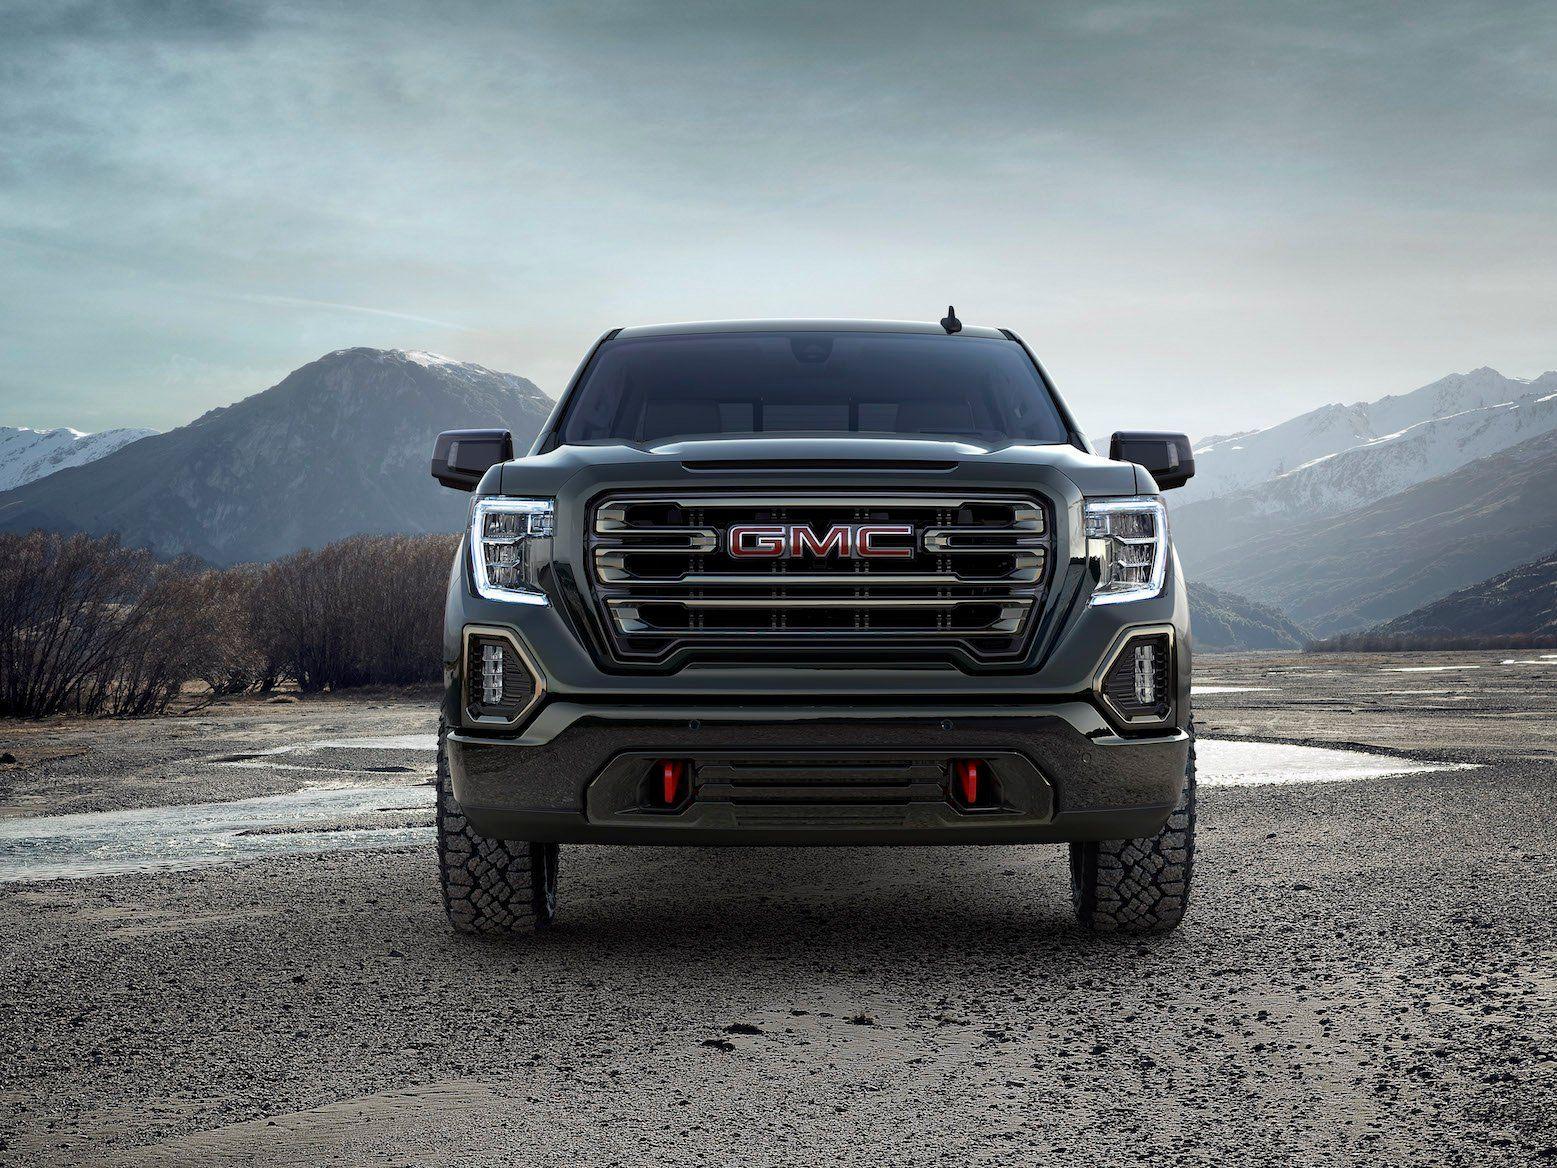 New Suvs Trucks At New York Auto Show For Sale In 2018 Gmc Trucks Gmc Sierra Chevy Trucks